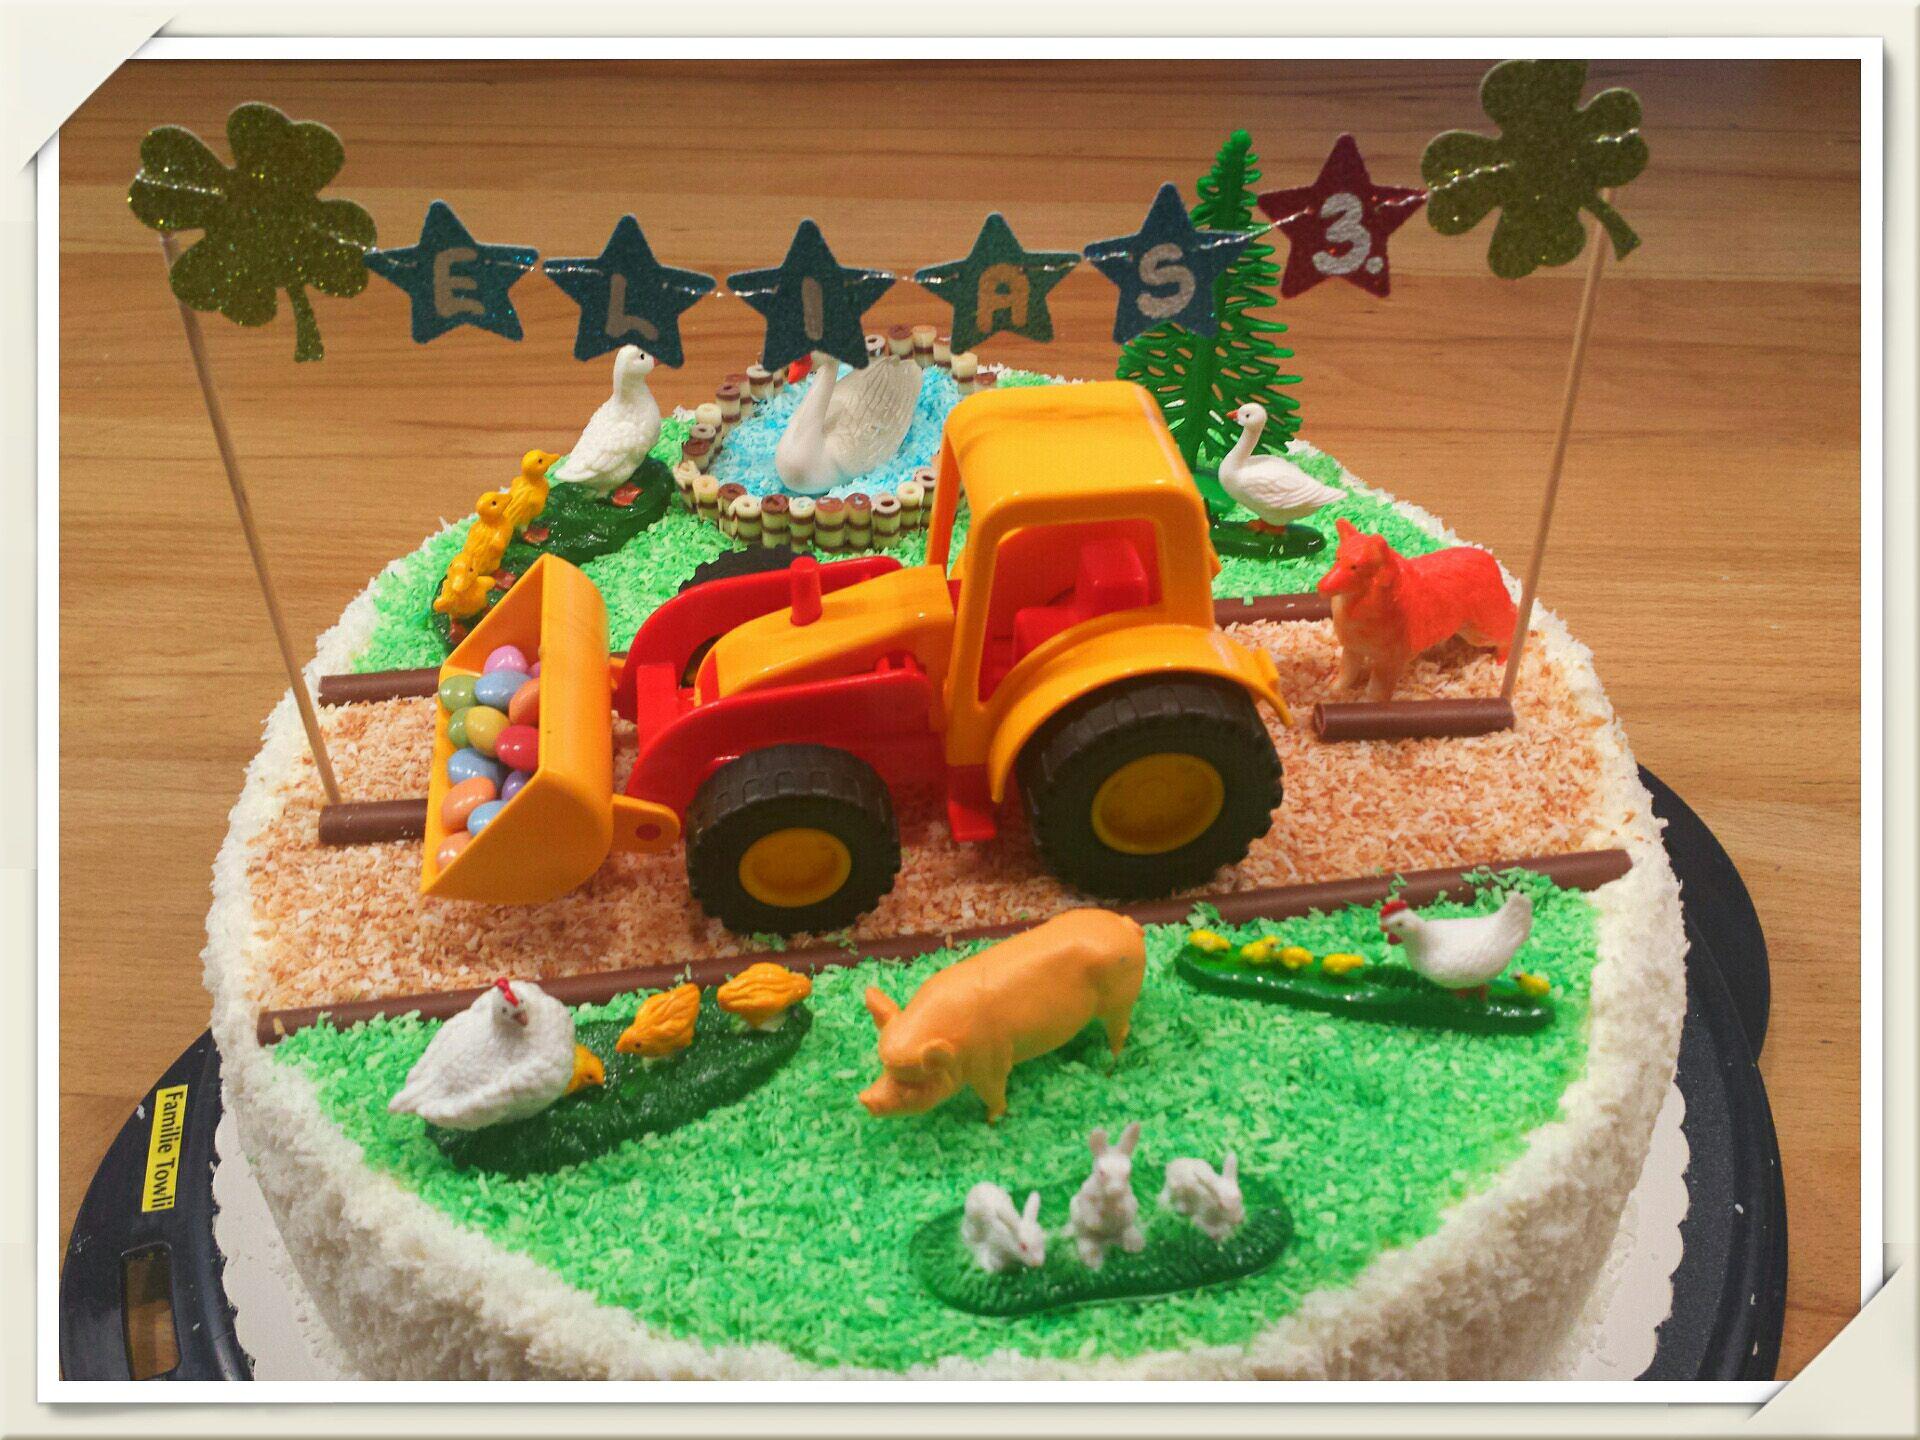 Traktor kuchen google search birthday pinterest kuchen - Pinterest kuchen ...